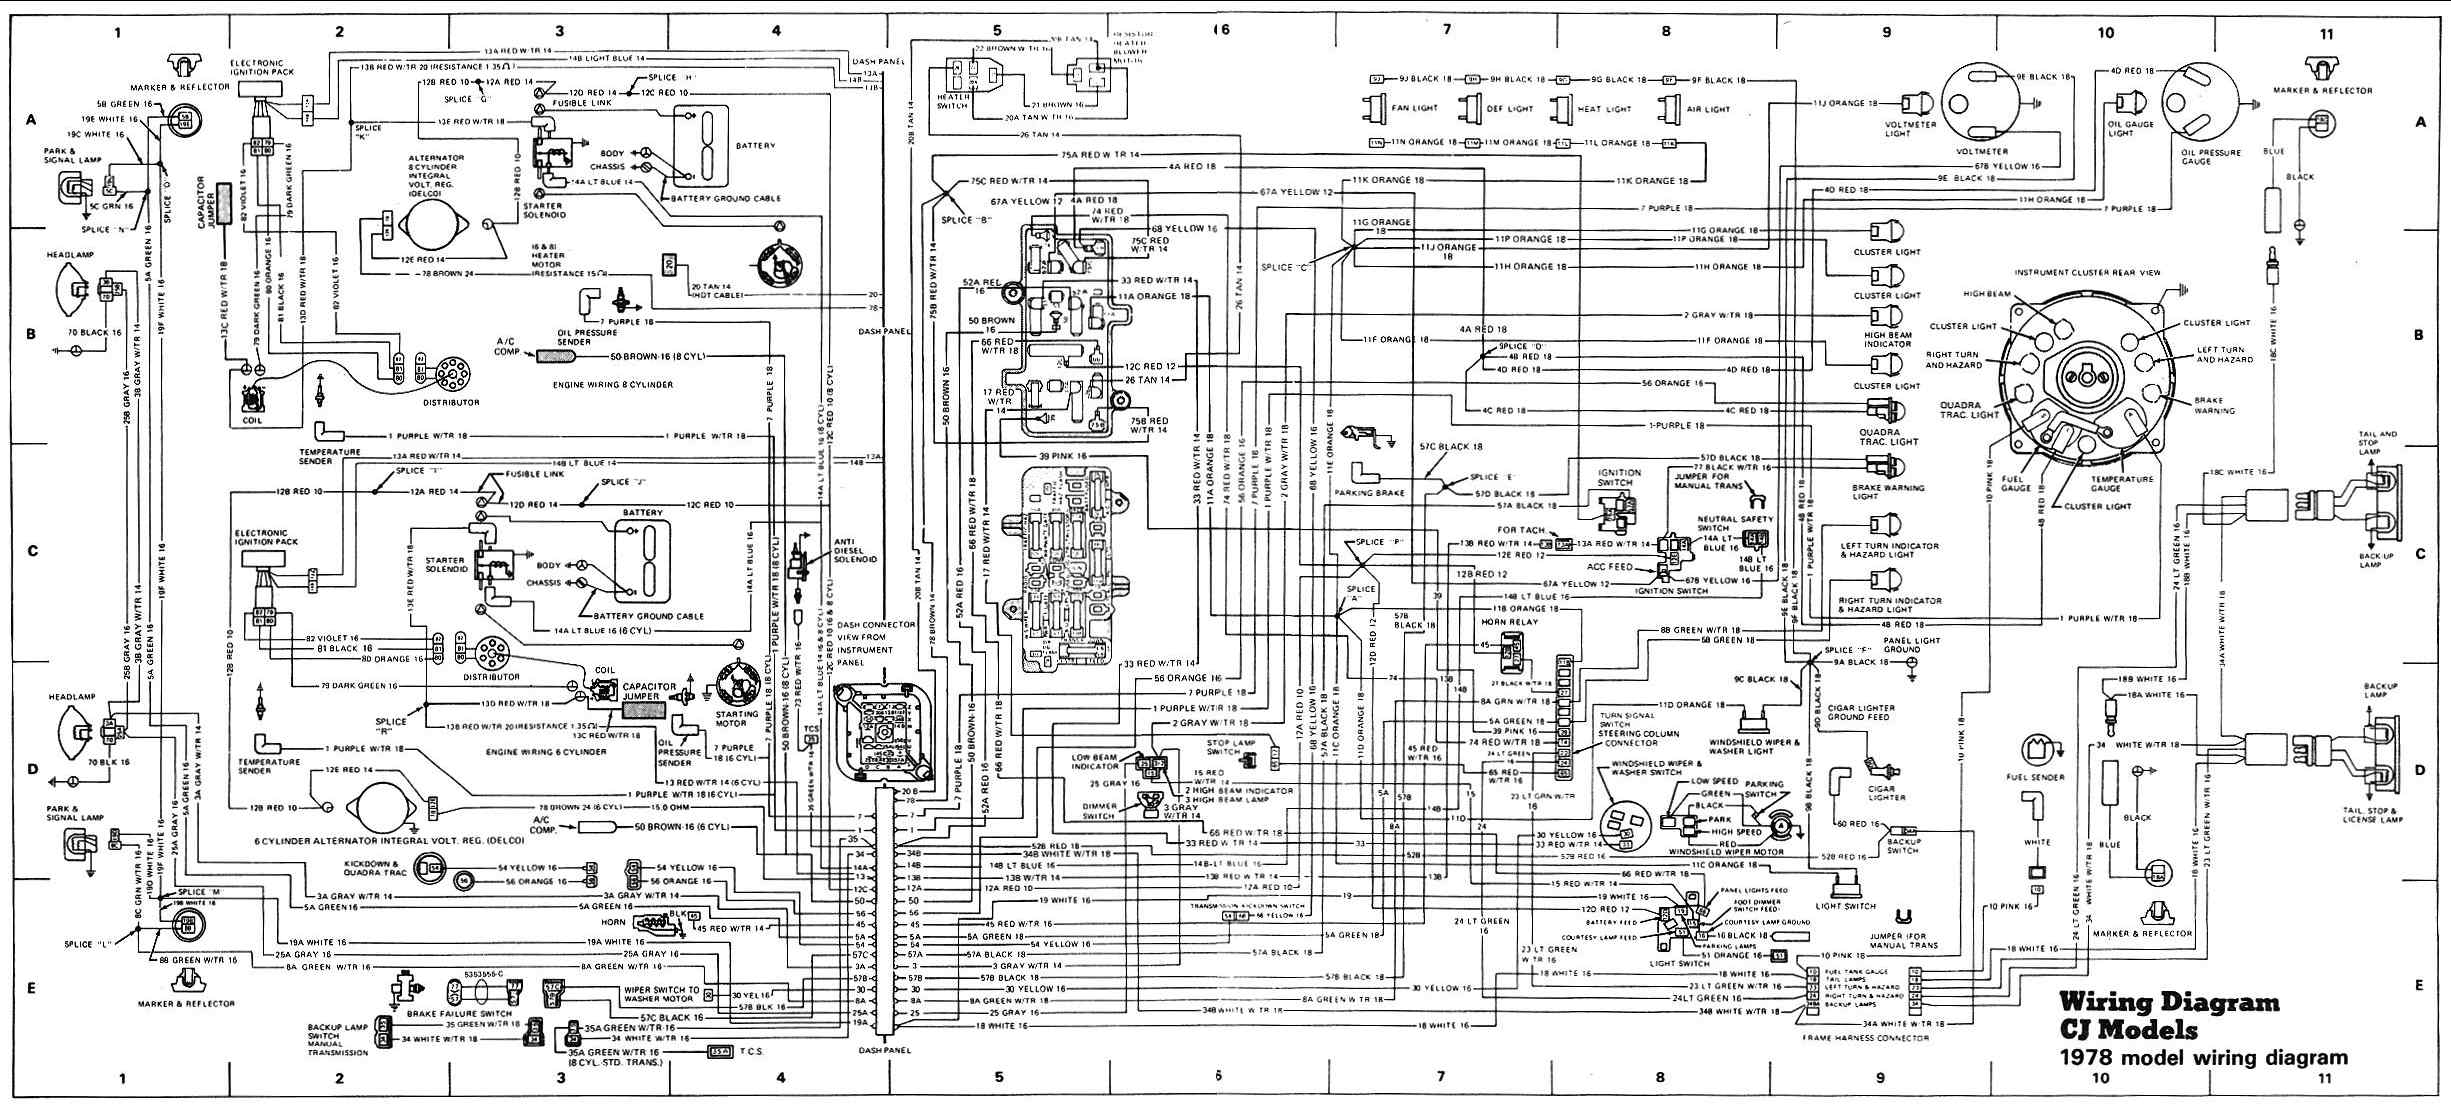 1998 Jeep Cherokee Keyless Wiring Diagram Trusted Diagrams Xj Alternator 2002 Grand Harness Diy Enthusiasts 1997